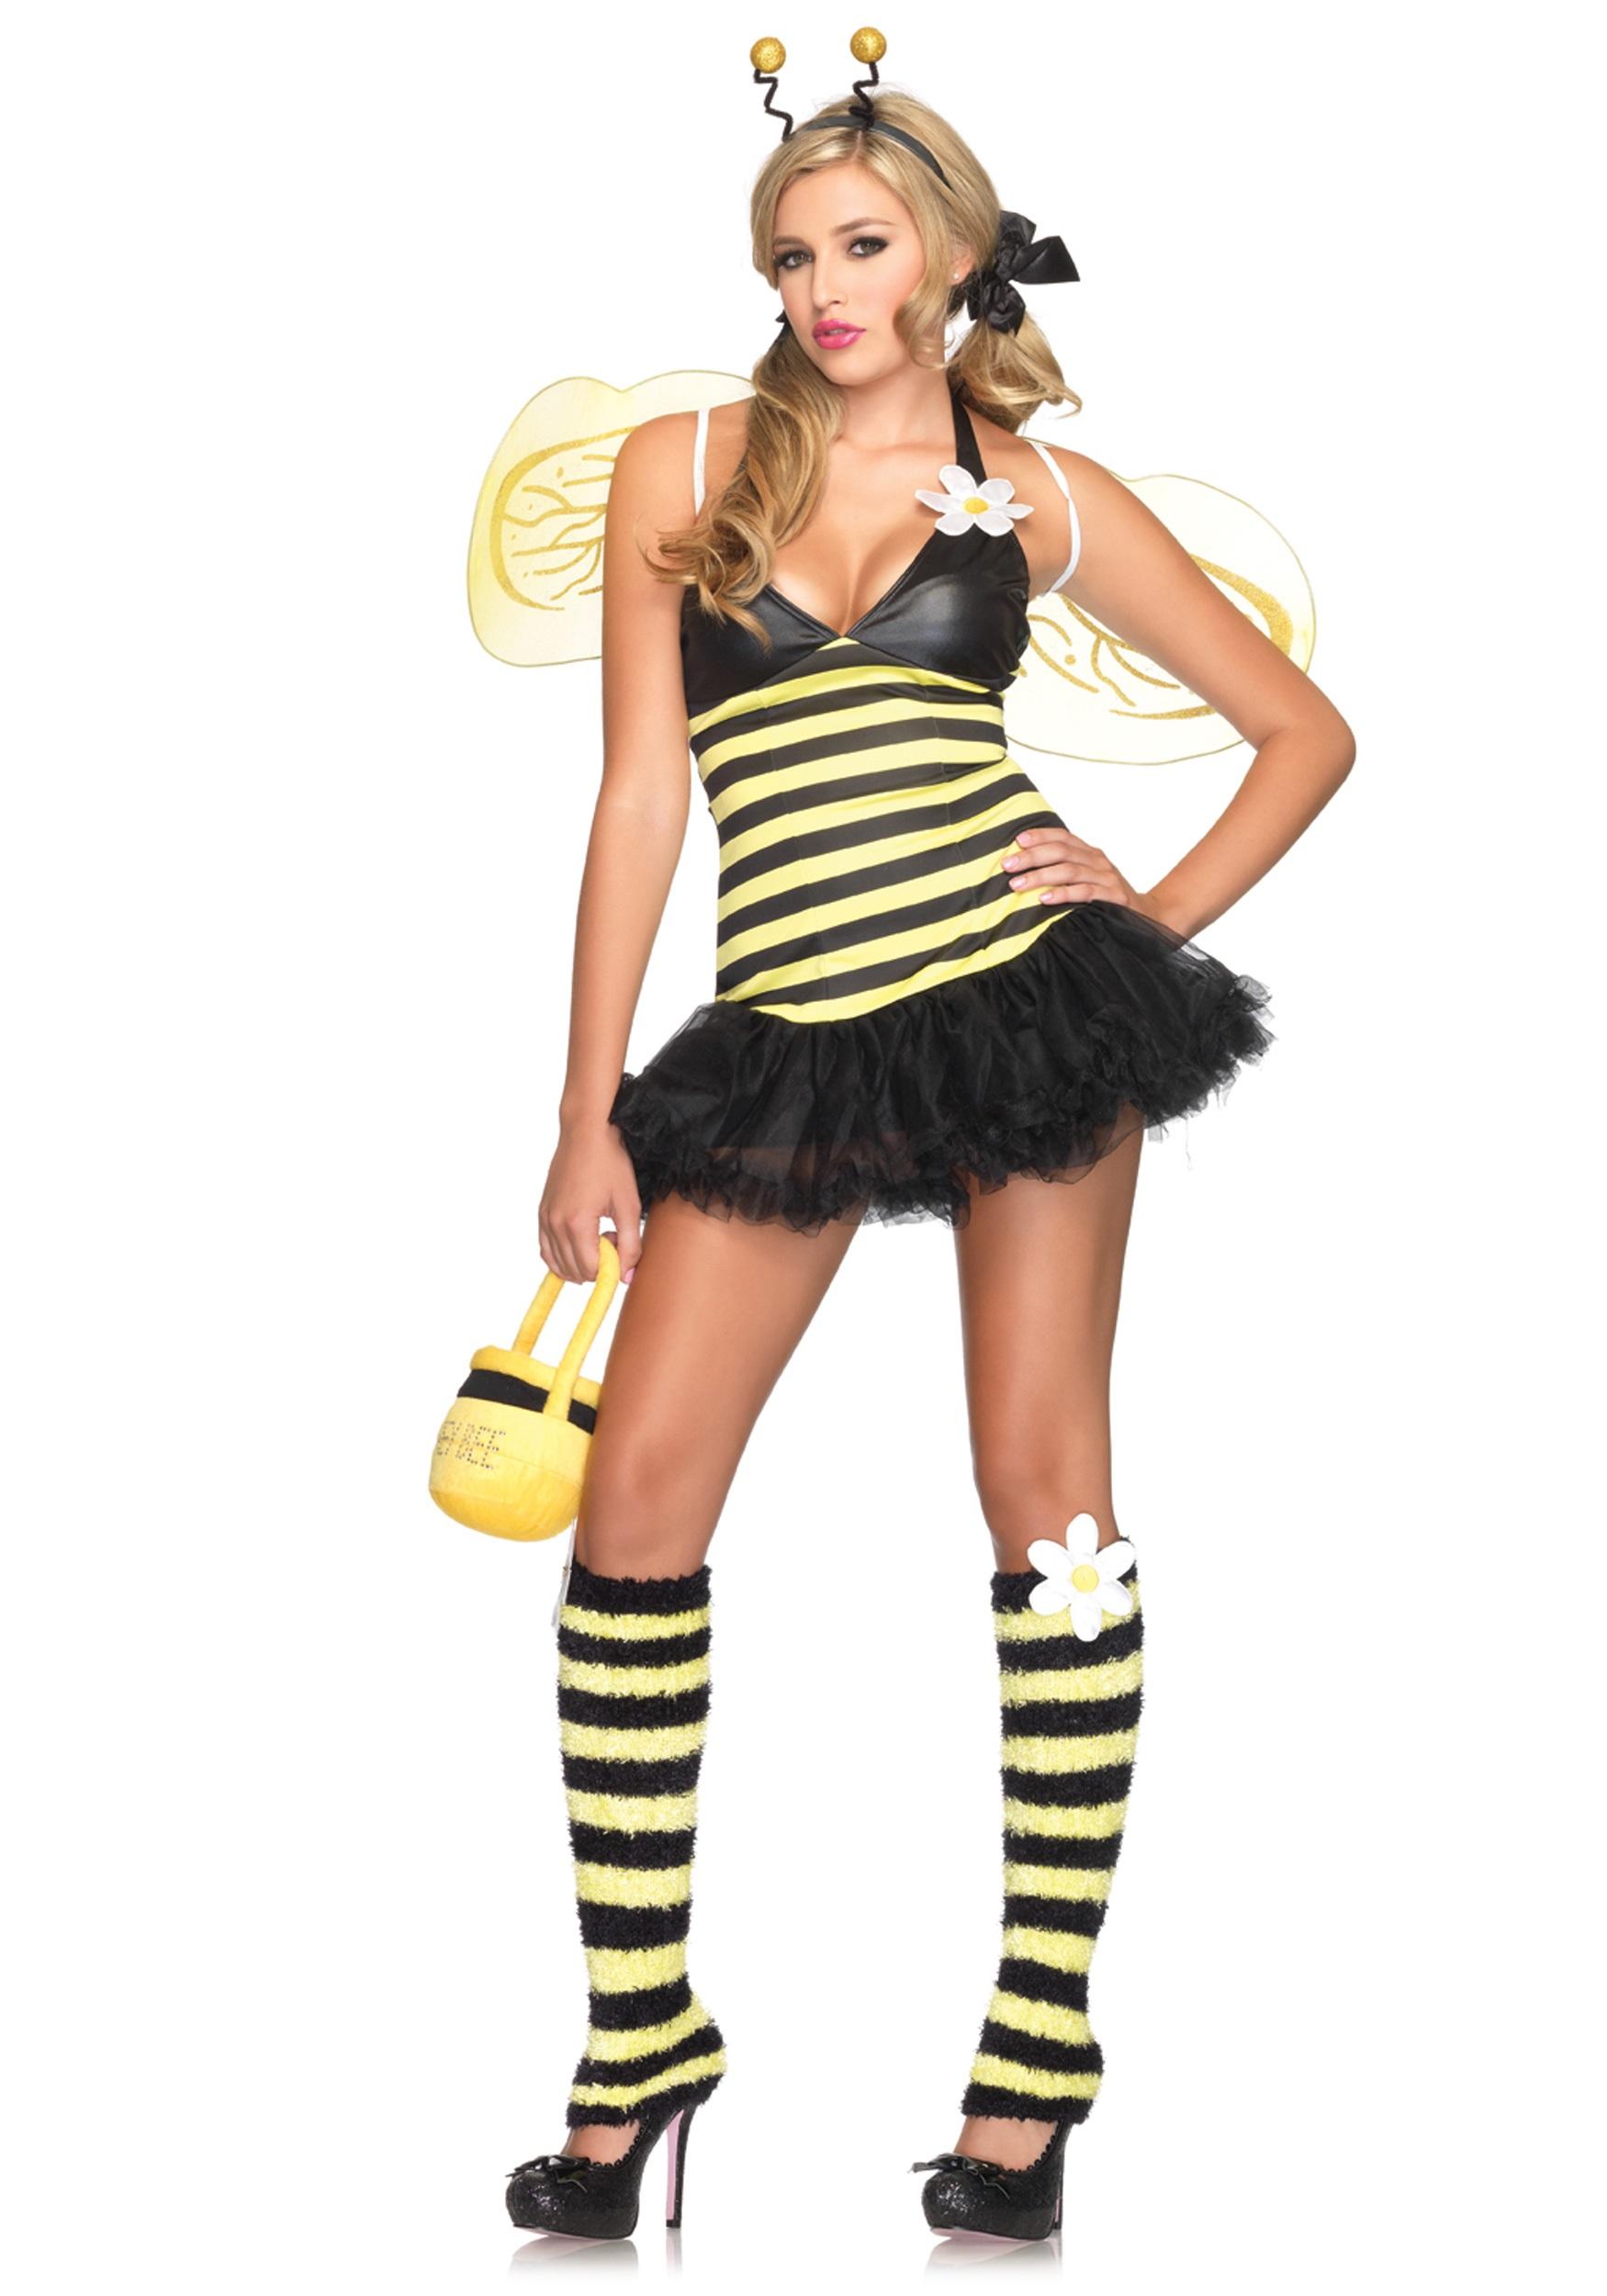 Daisy Bee Ladies Costume  sc 1 st  Halloween Costume & Daisy Bee Ladies Costume - Sexy Bumble Bee Insect Womens Costumes